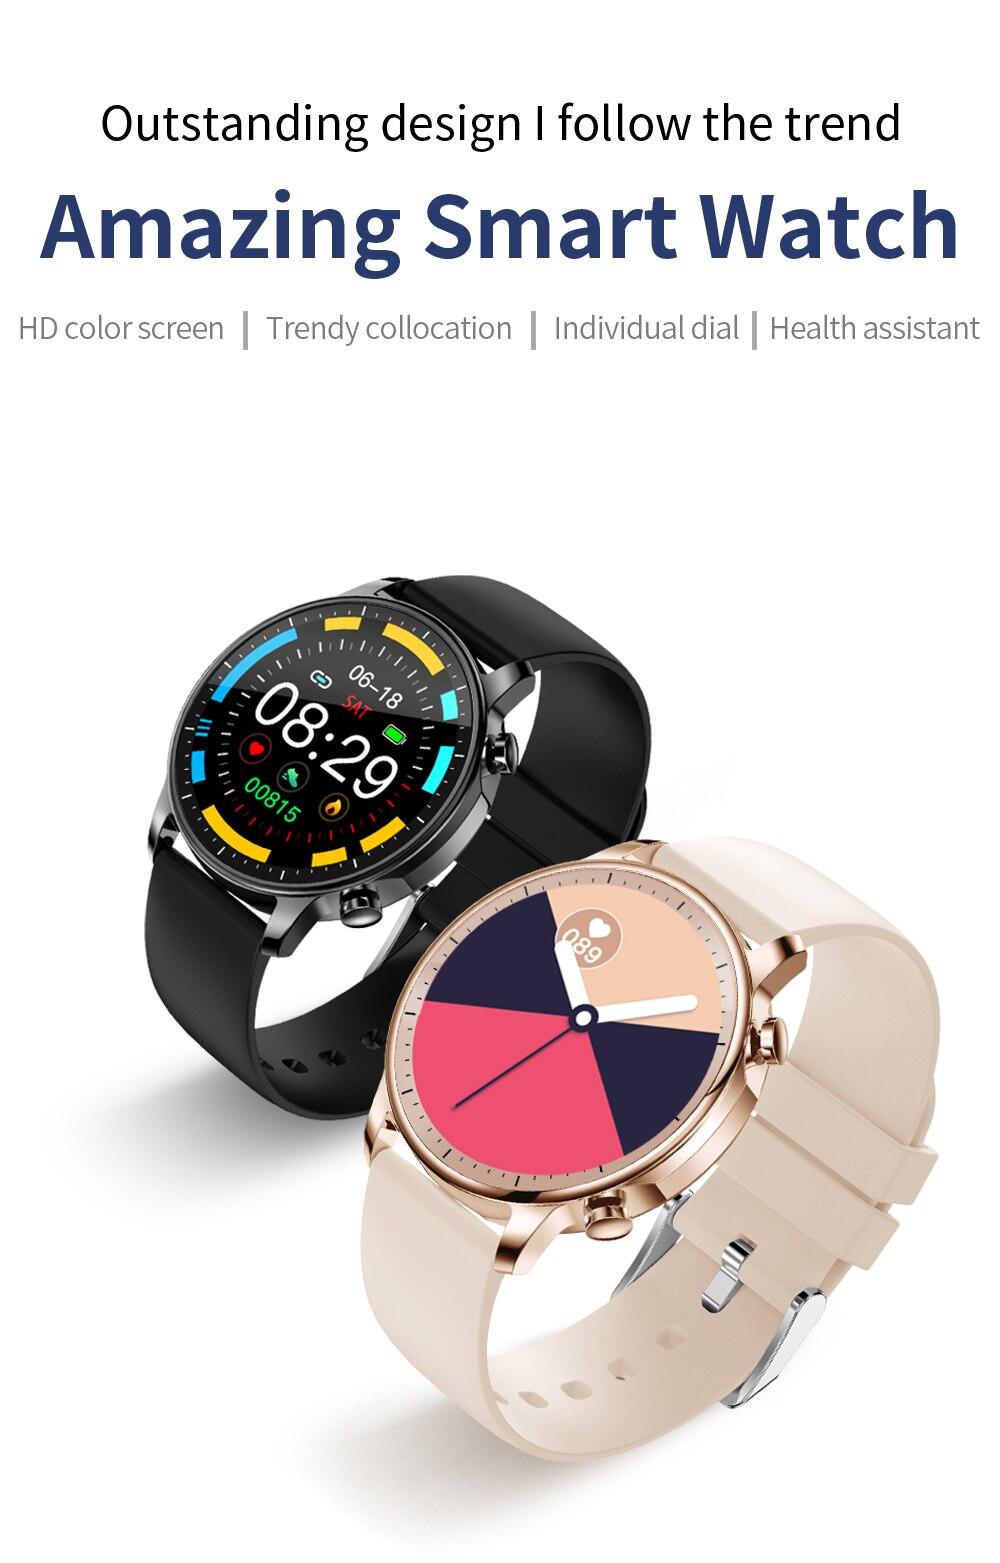 H29b8334fe94e4f54897796a0a2768a5dl COLMI V23 Women Smart Watch Full Touch Fitness Tracker IP67 Waterproof Blood Pressure Smart Clock Men Smartwatch